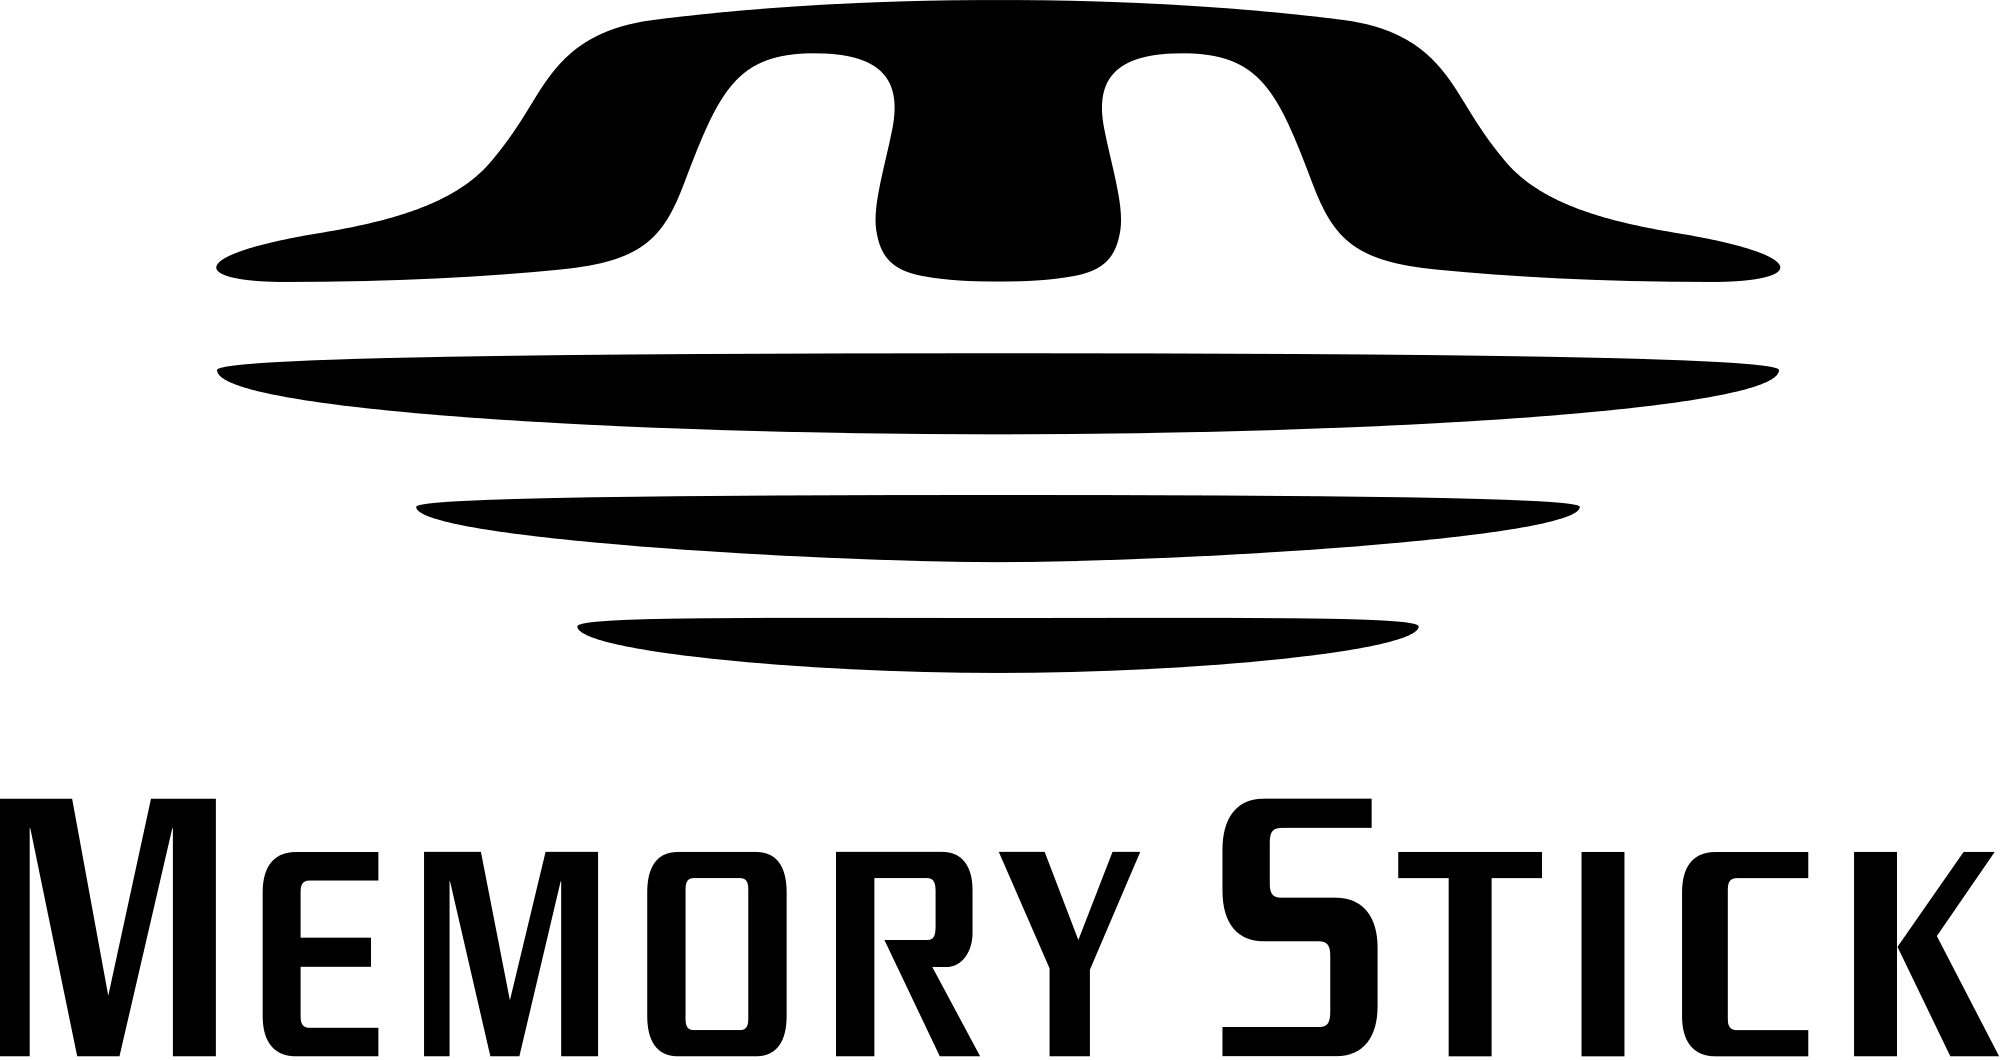 Memories clipart svg. File memorystick logo wikimedia